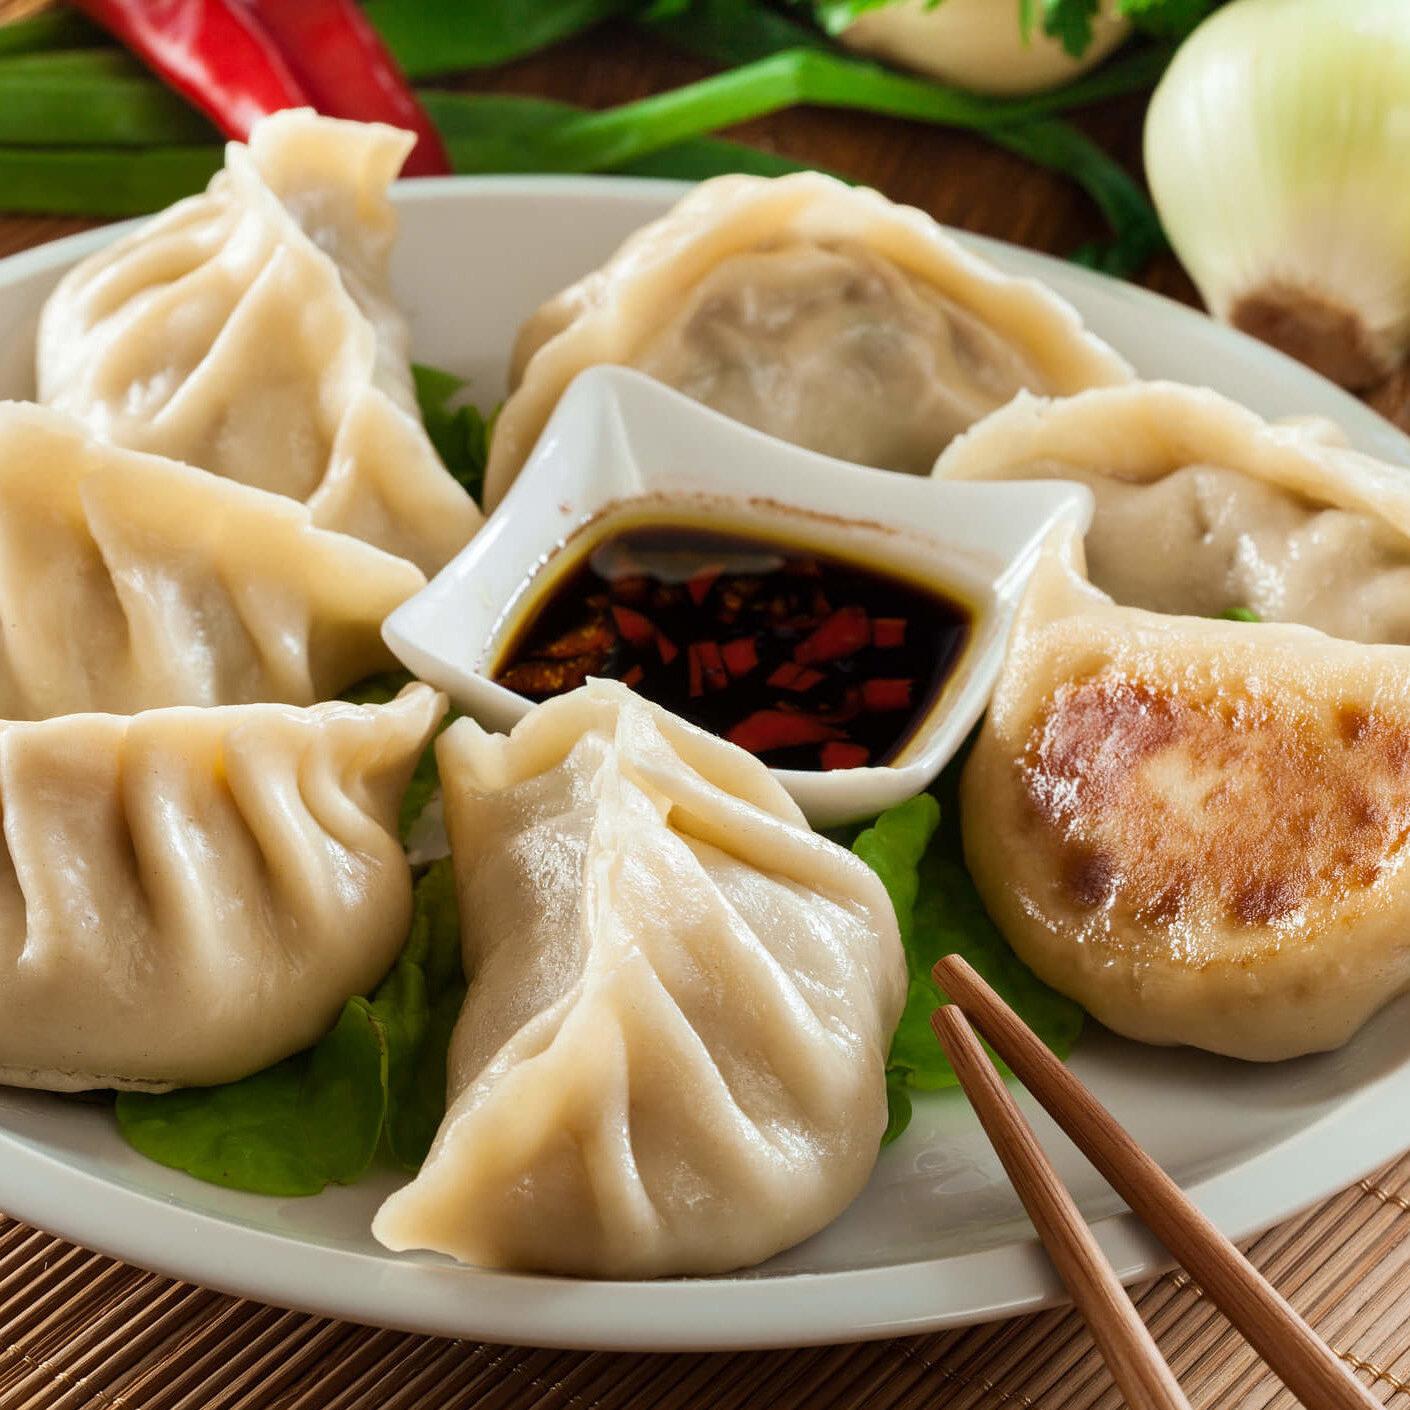 selbstgemachte Dumplings online live selber kochen